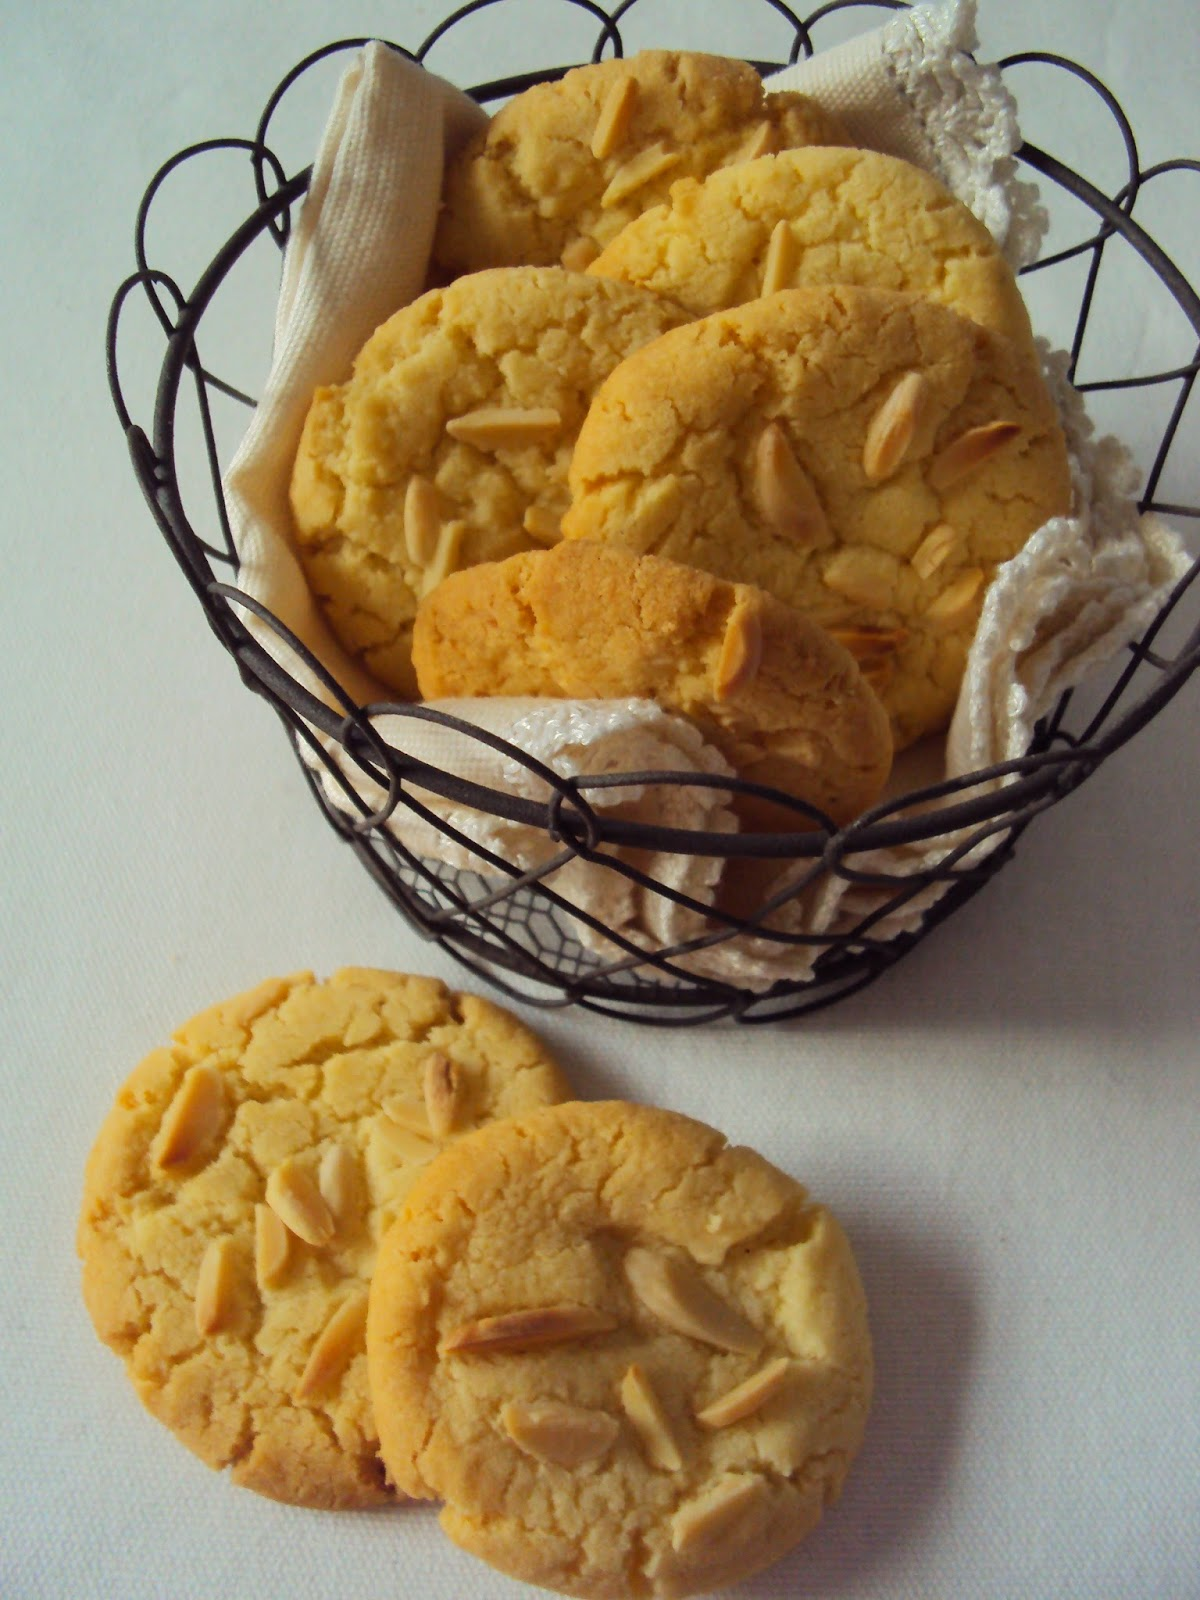 Dig In: almond crisp biscuits1200 x 1600 jpeg 238kB